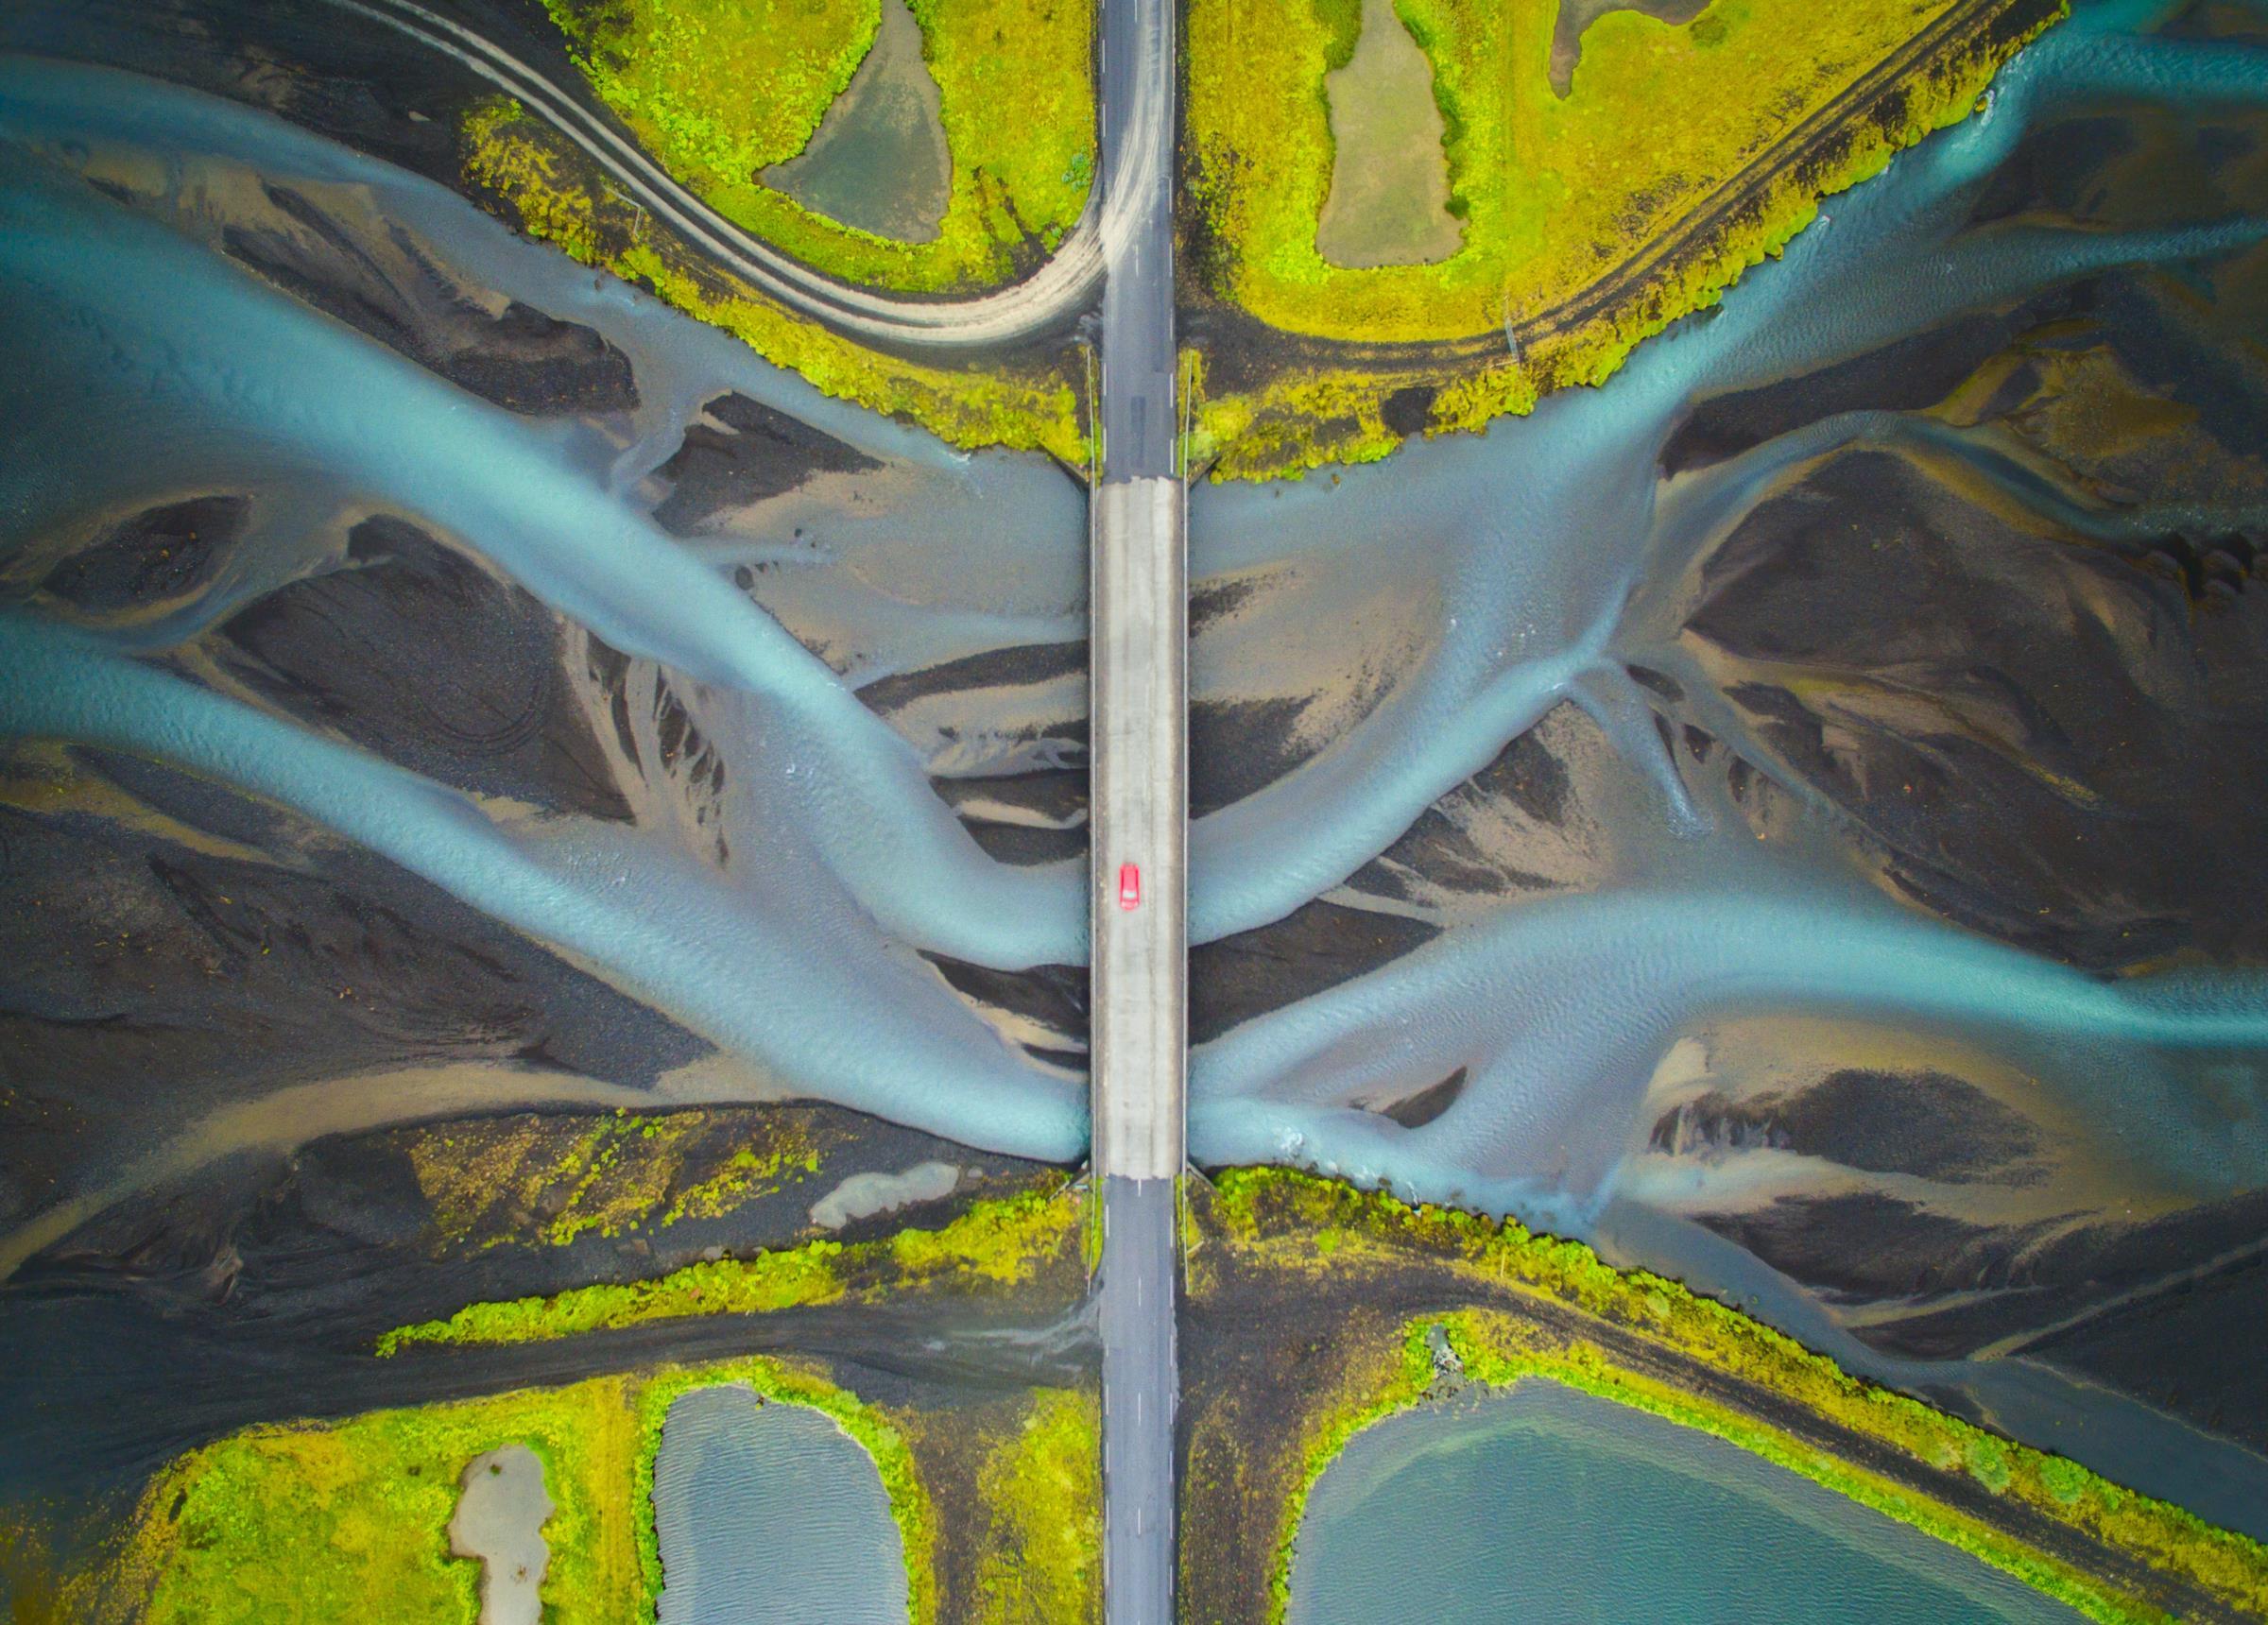 Categoria Viagem — World Photography Organisation